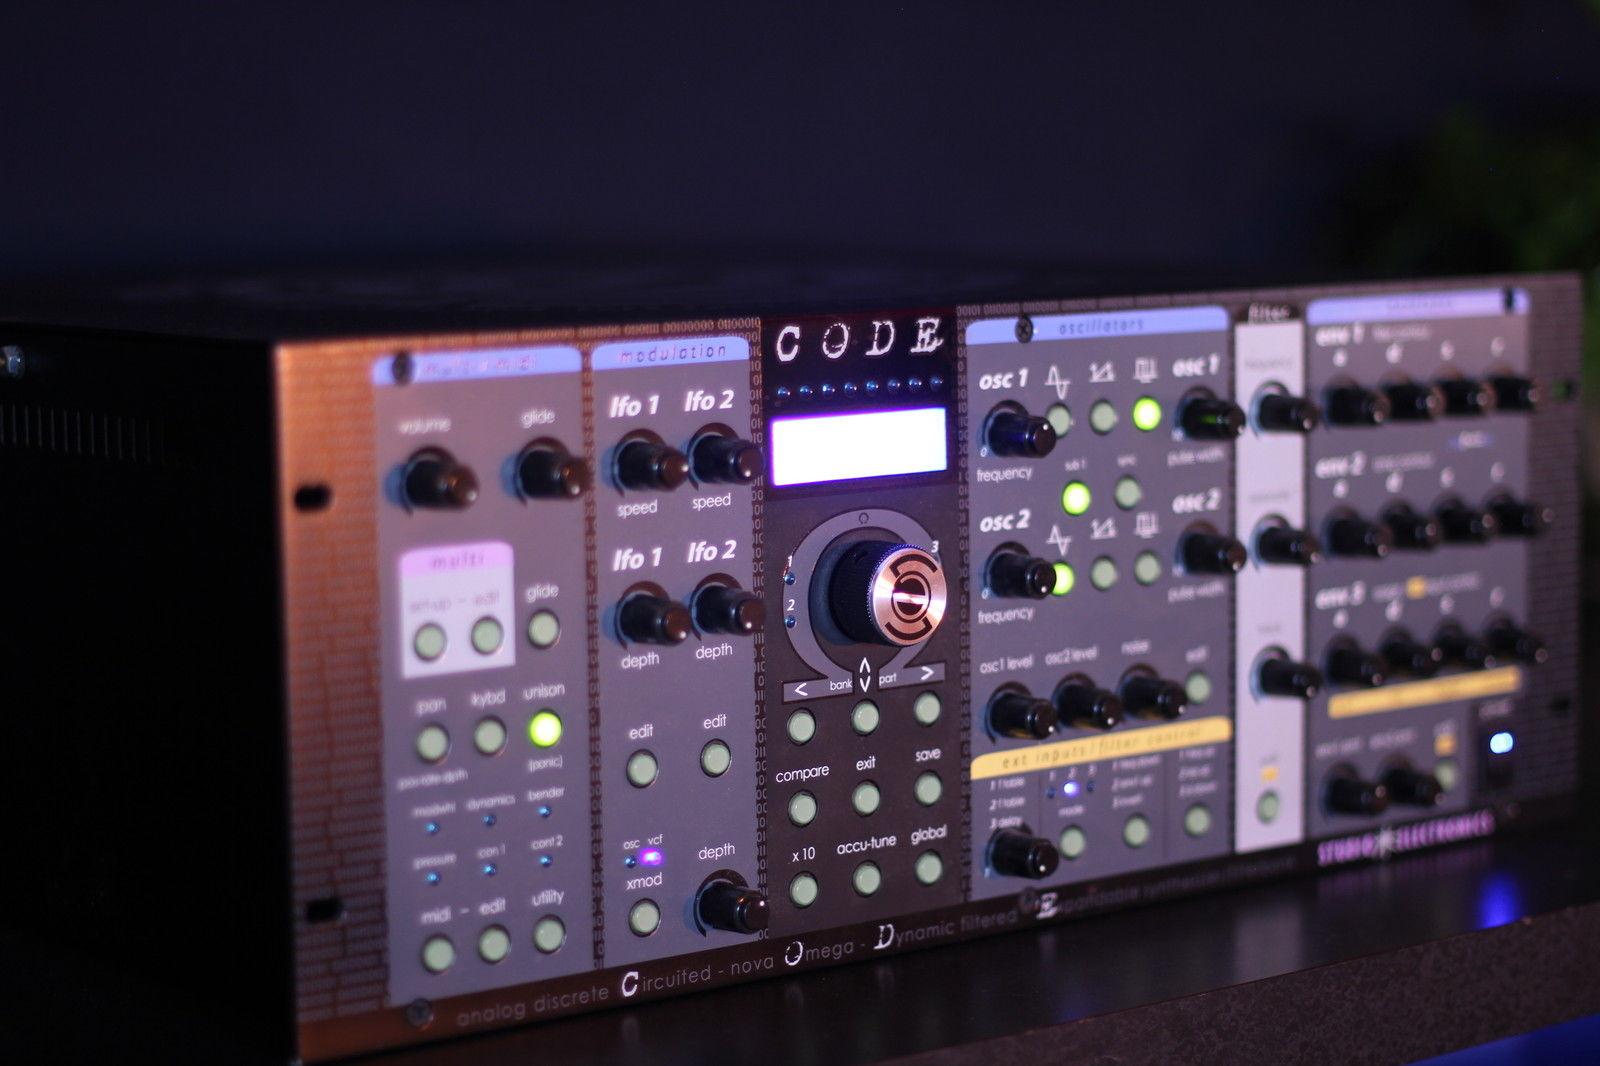 Matrixsynth Monday September 15 2014 Diy Voltagecontrolled Amplifier Hackme Via This Auction